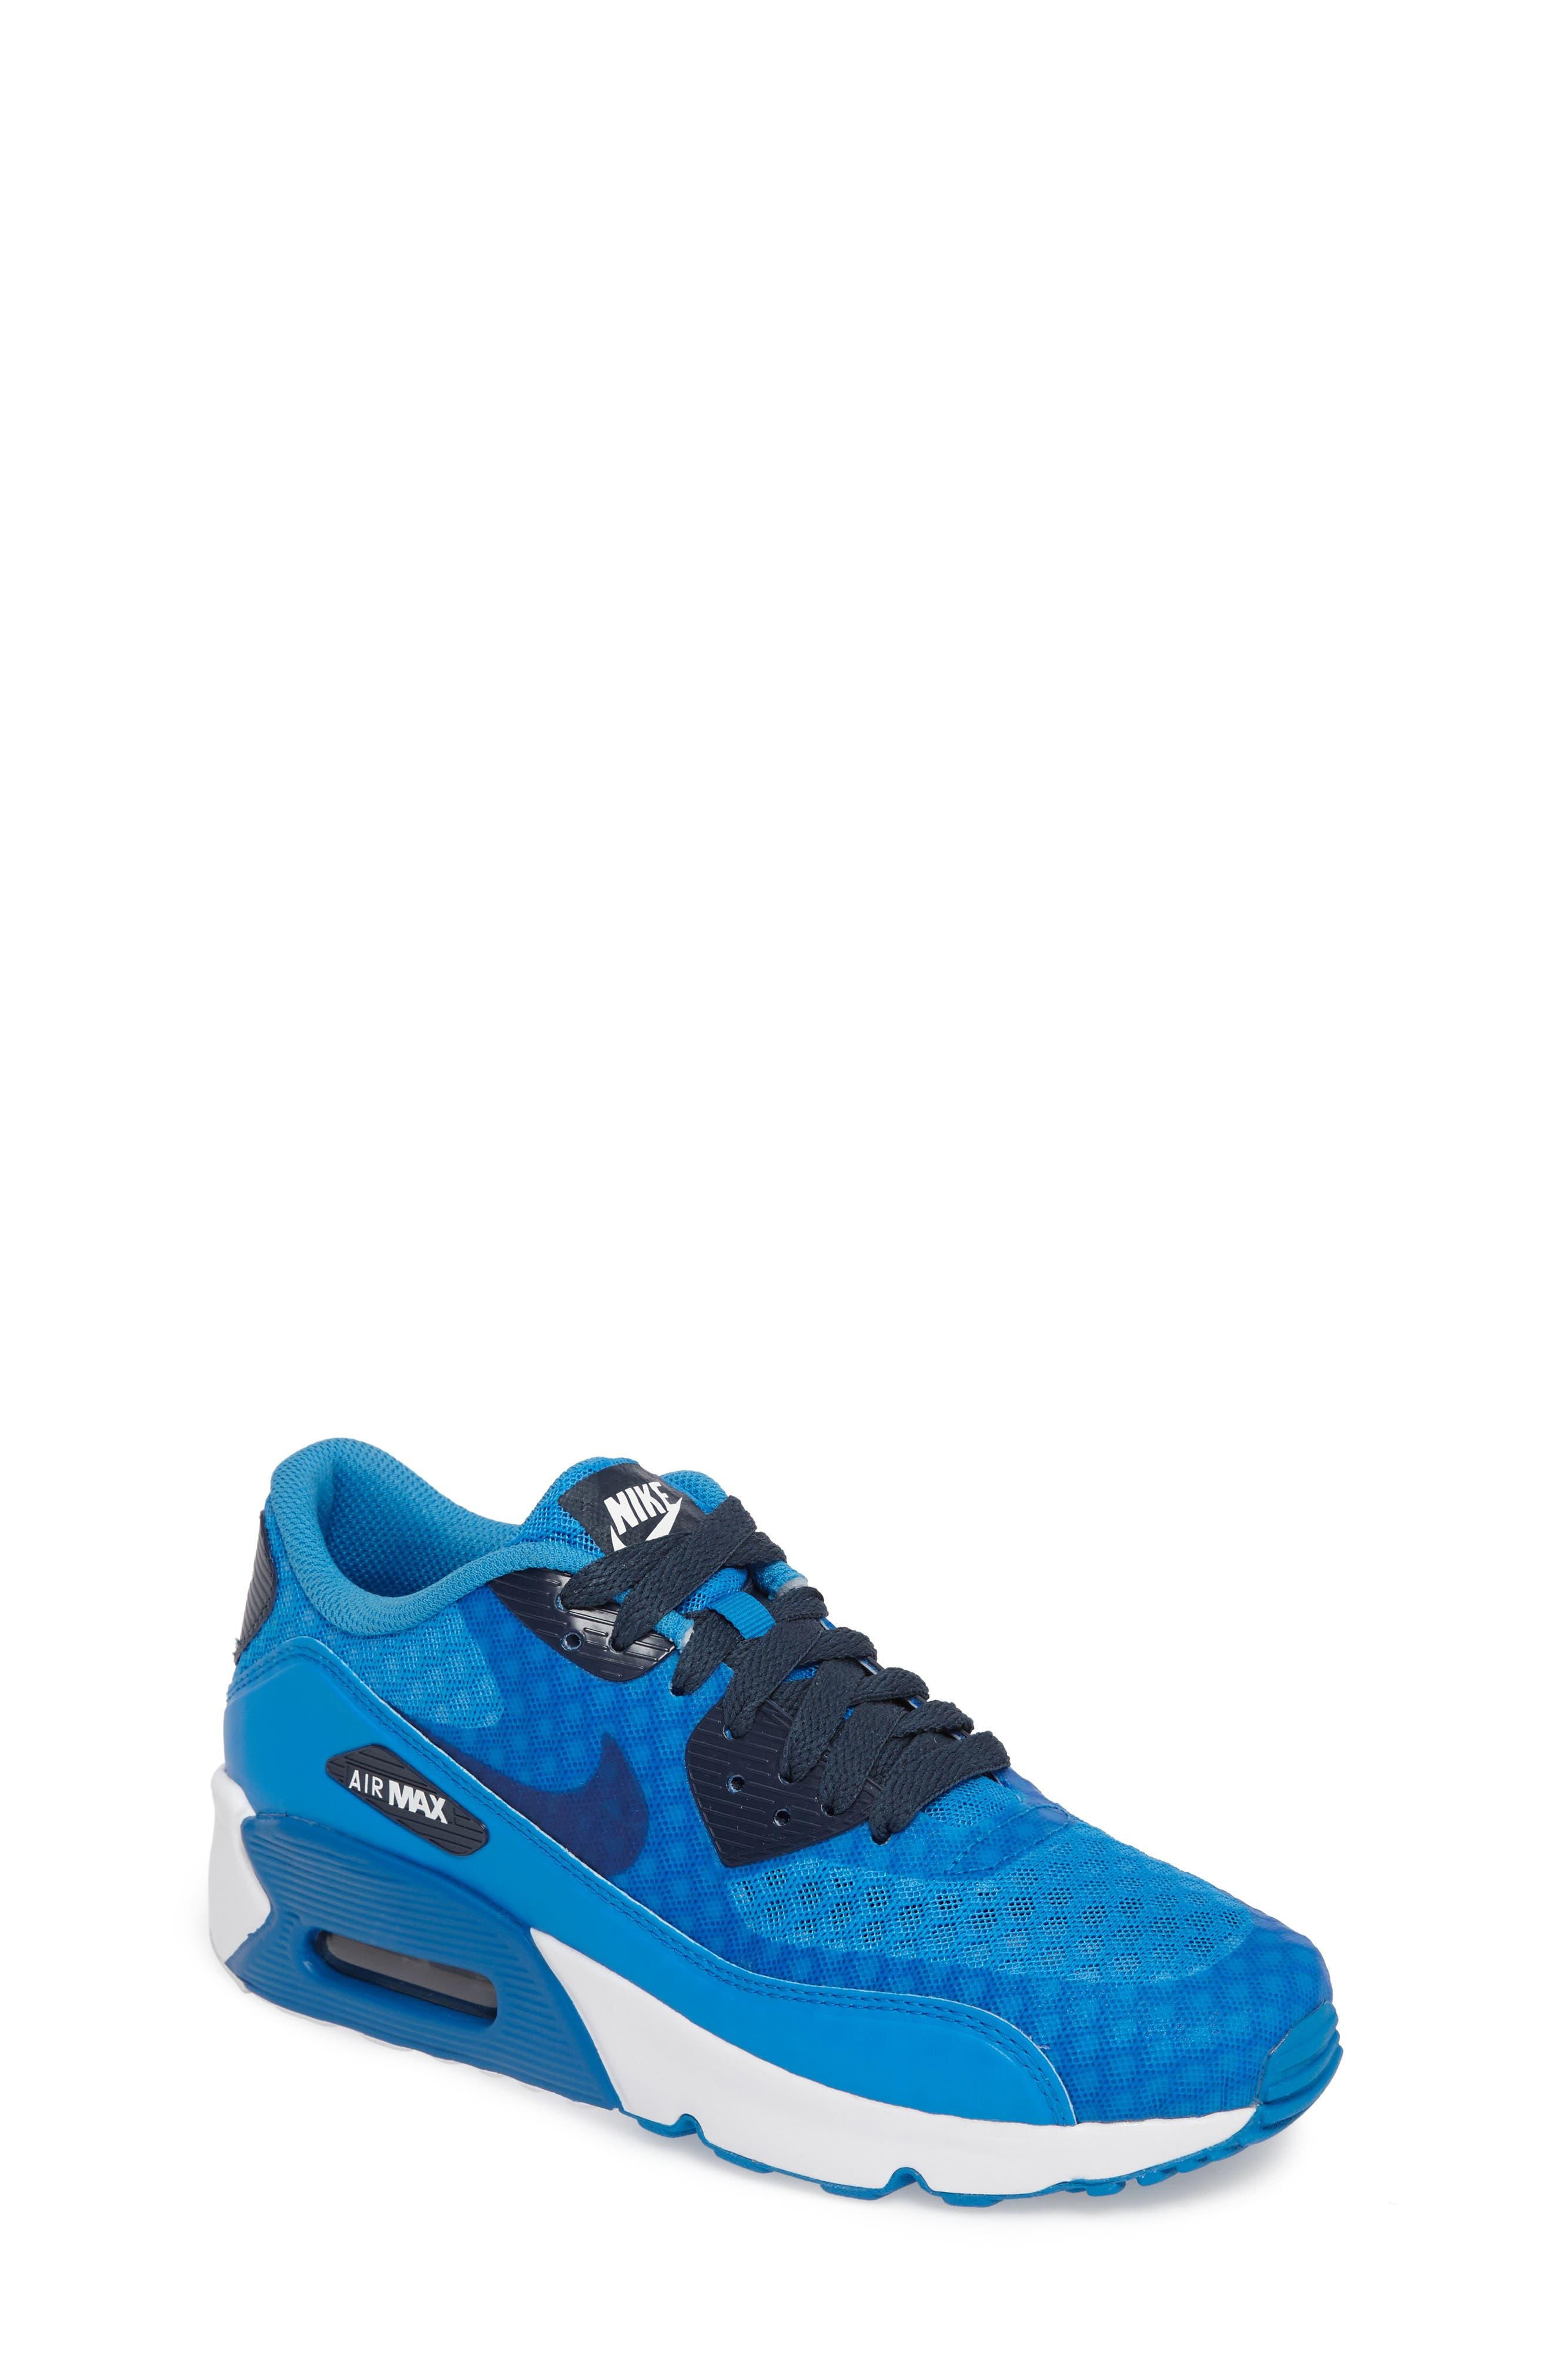 Nike Air Max 90 Ultra 2.0 Breathe Sneaker (Big Kid)